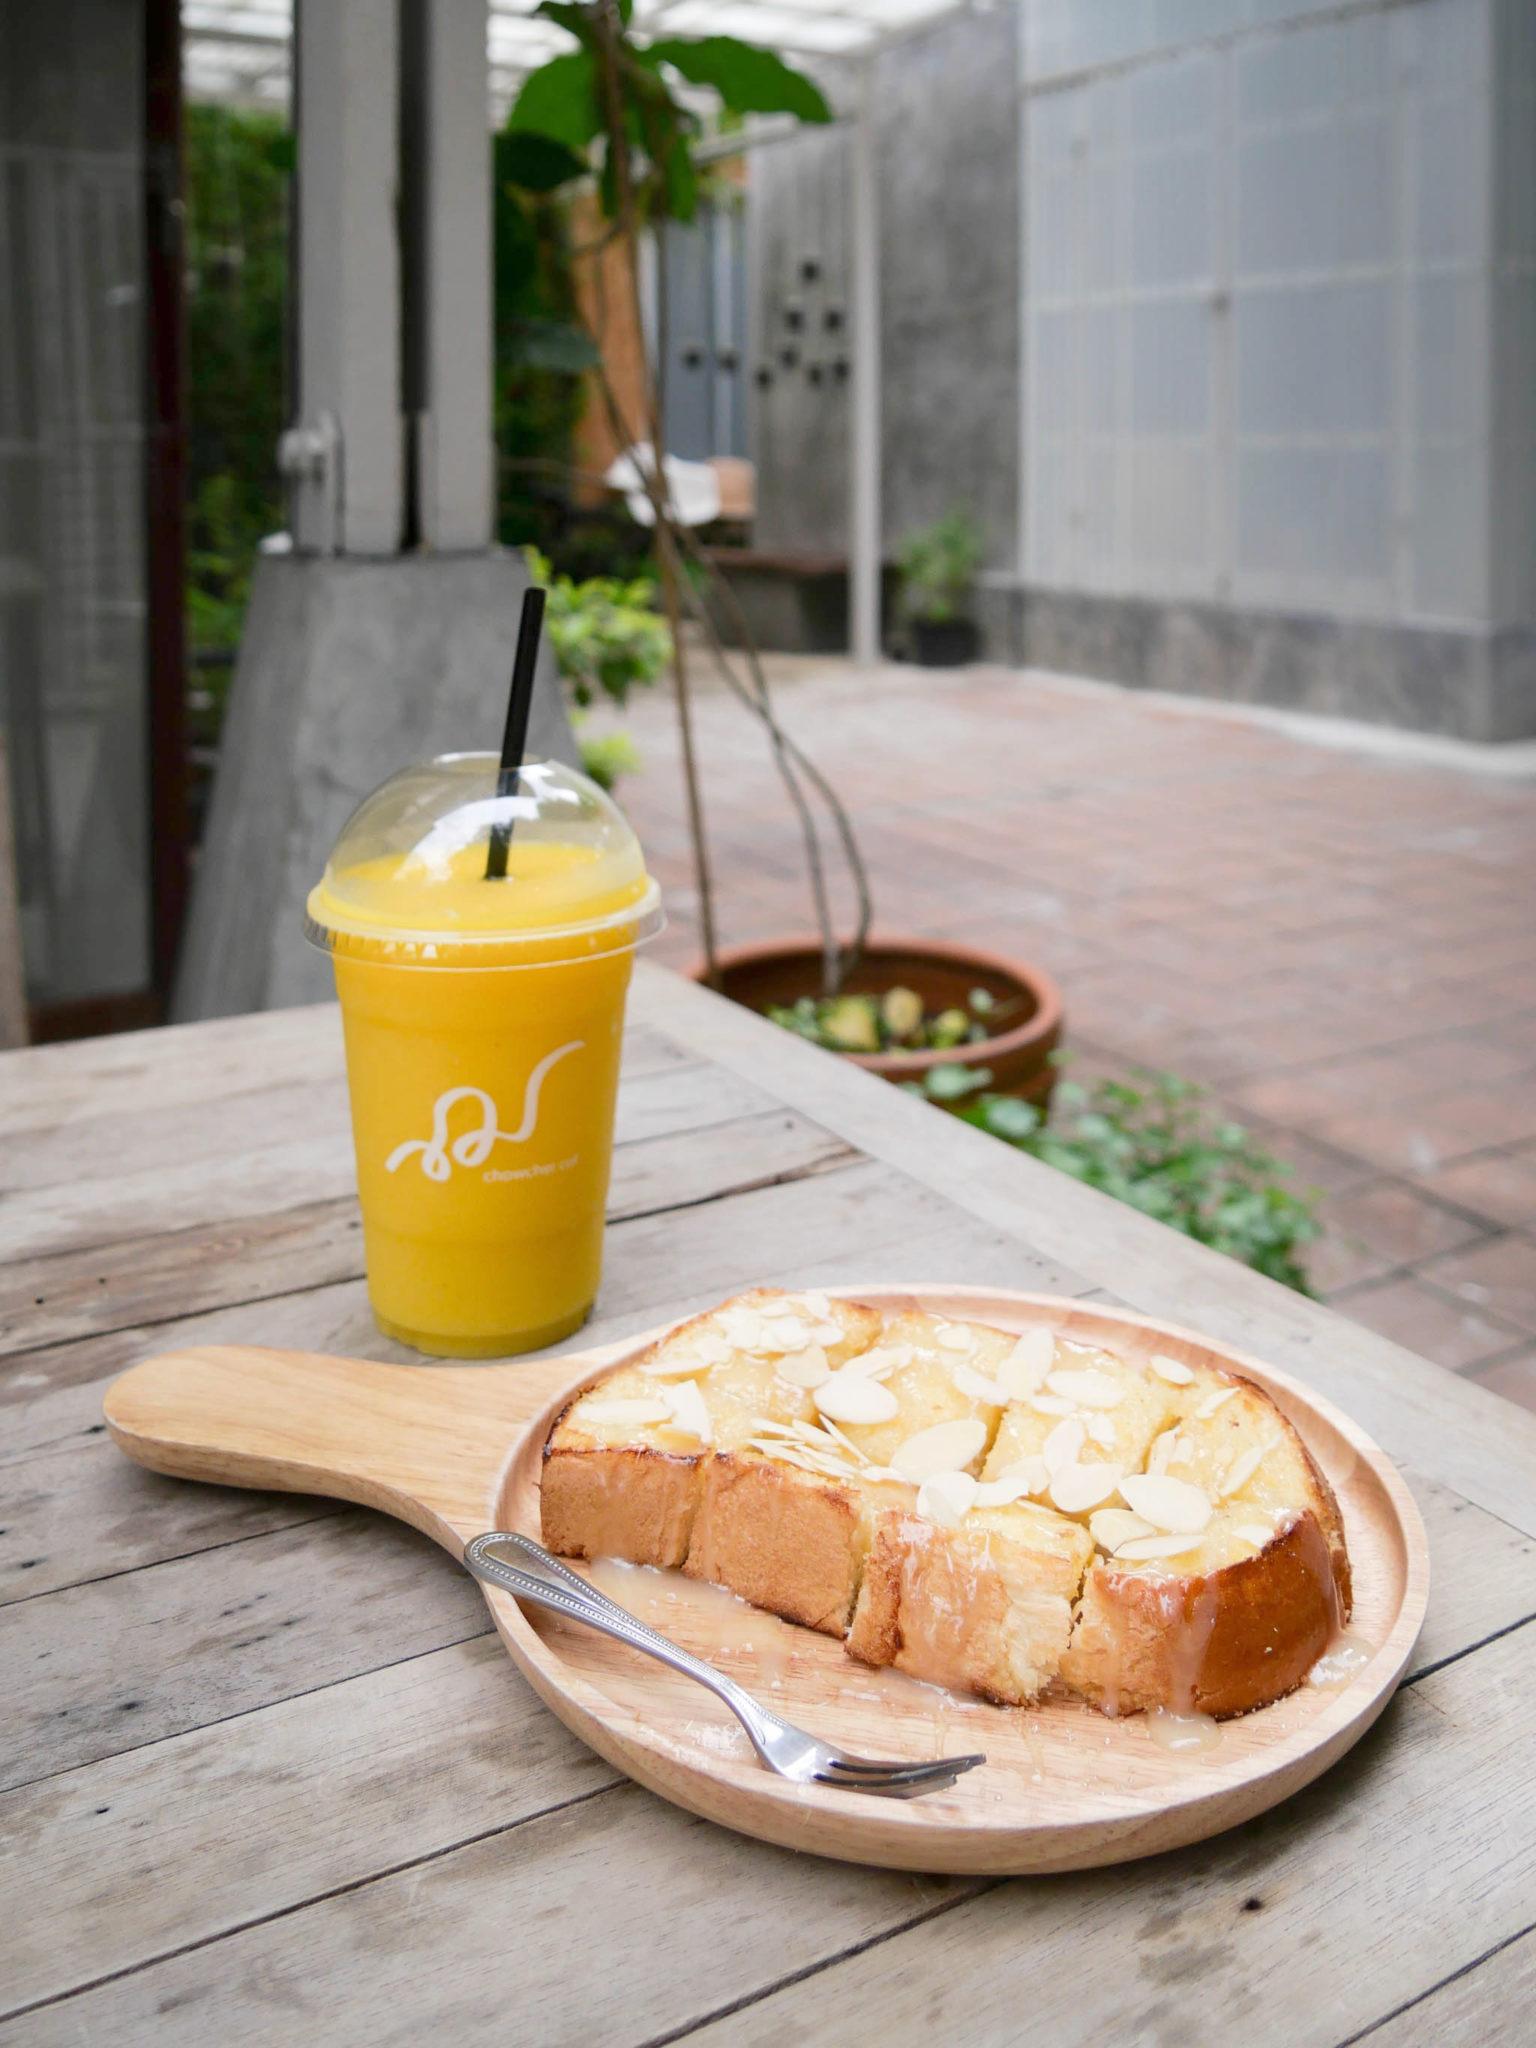 "7 Simply Creative Cafe & Bar ในย่านไลฟ์สไลต์สุดฮิป กับ 24 Hr. Co-Working Space กลาง New Interchange ""รัชดา - ลาดพร้าว"" 19 - cafe"